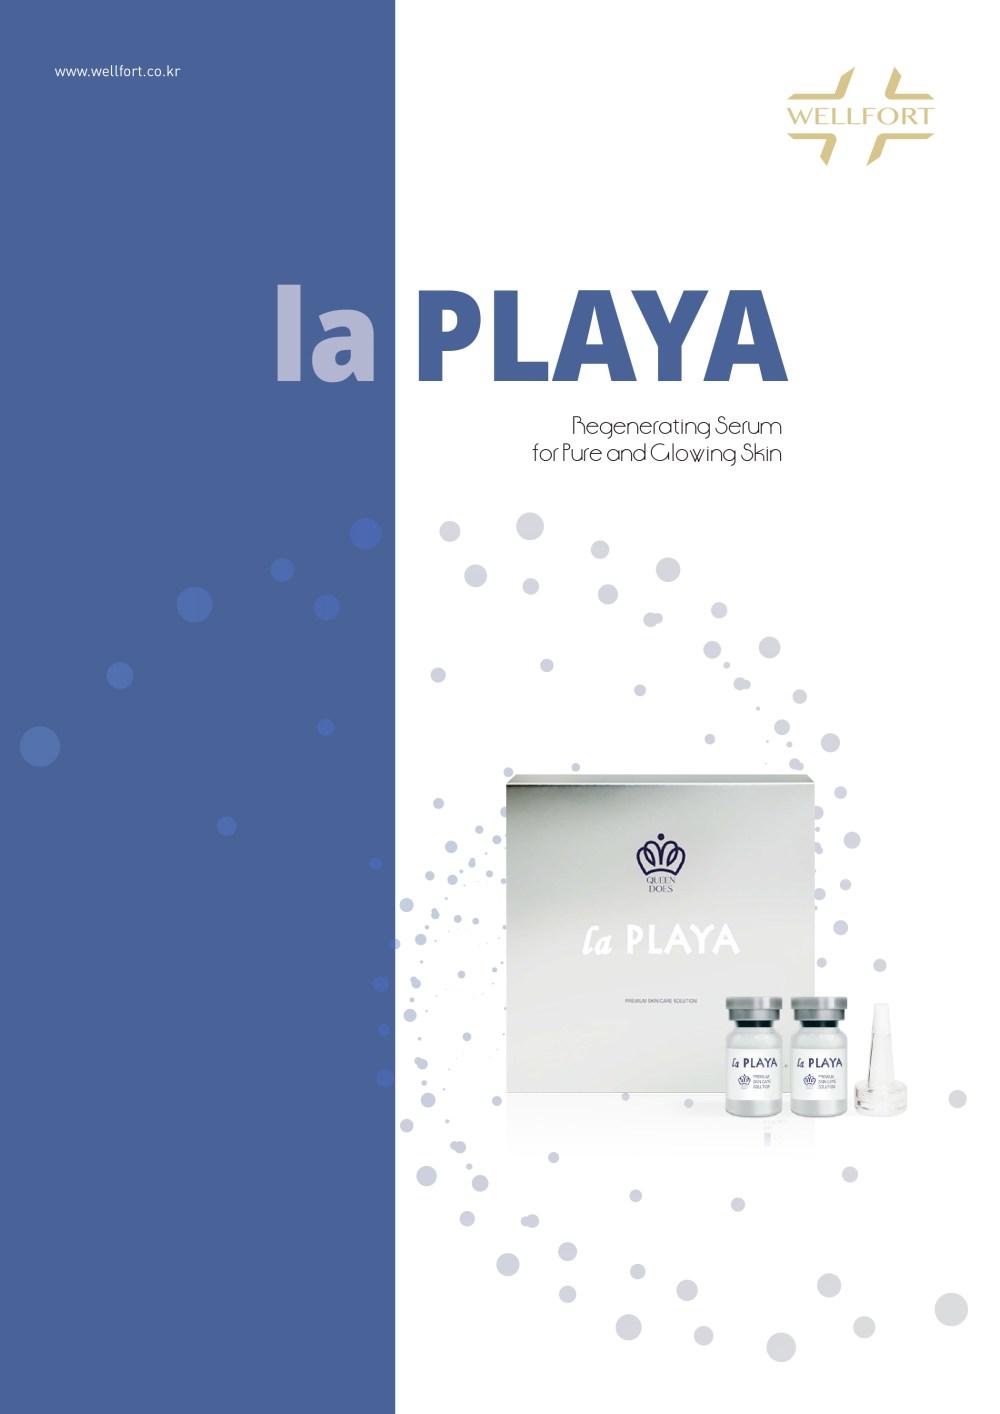 la PLAYA Regenerating Serum for Pure and Glowing Skin www.wellfort.co.kr